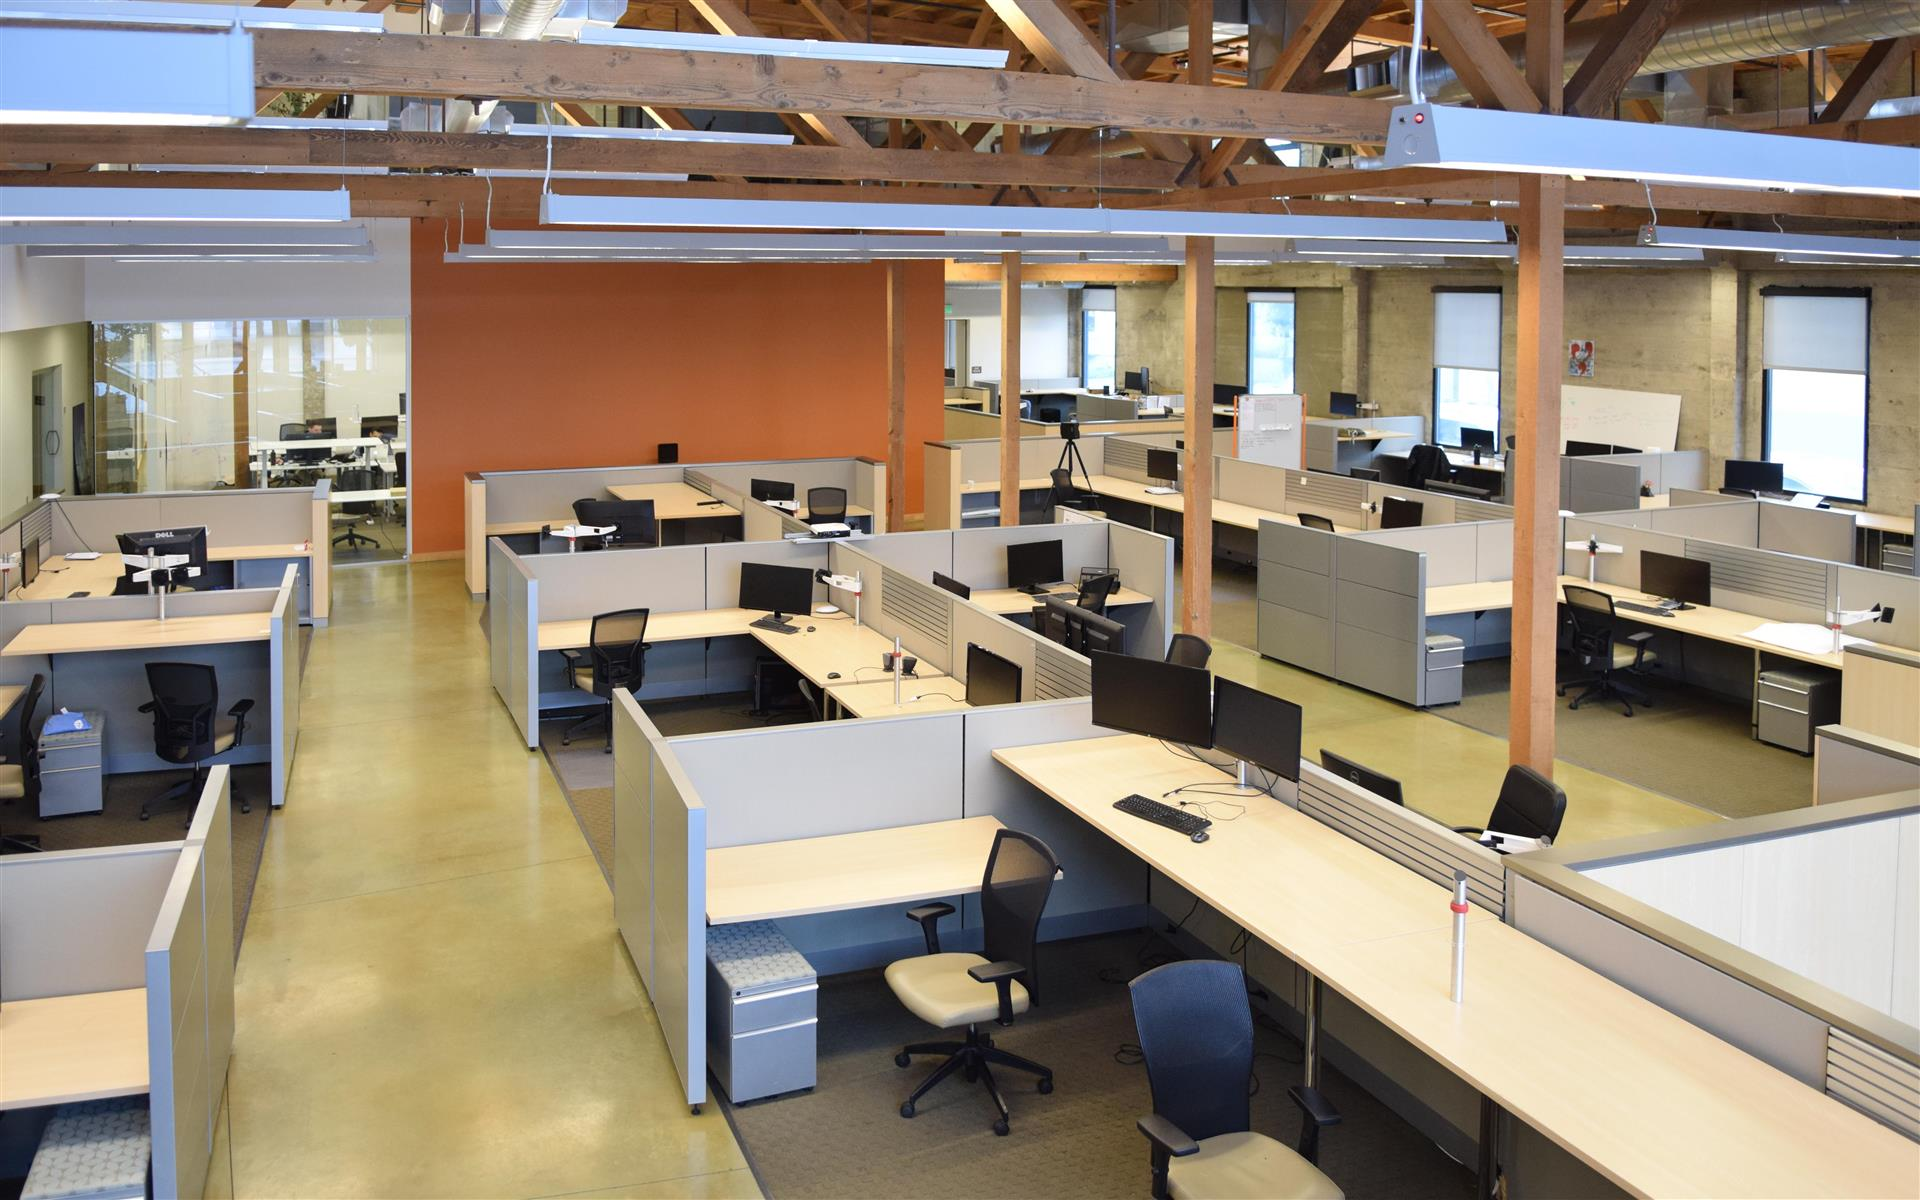 Onerent - Open Desks, Sitting or Standing